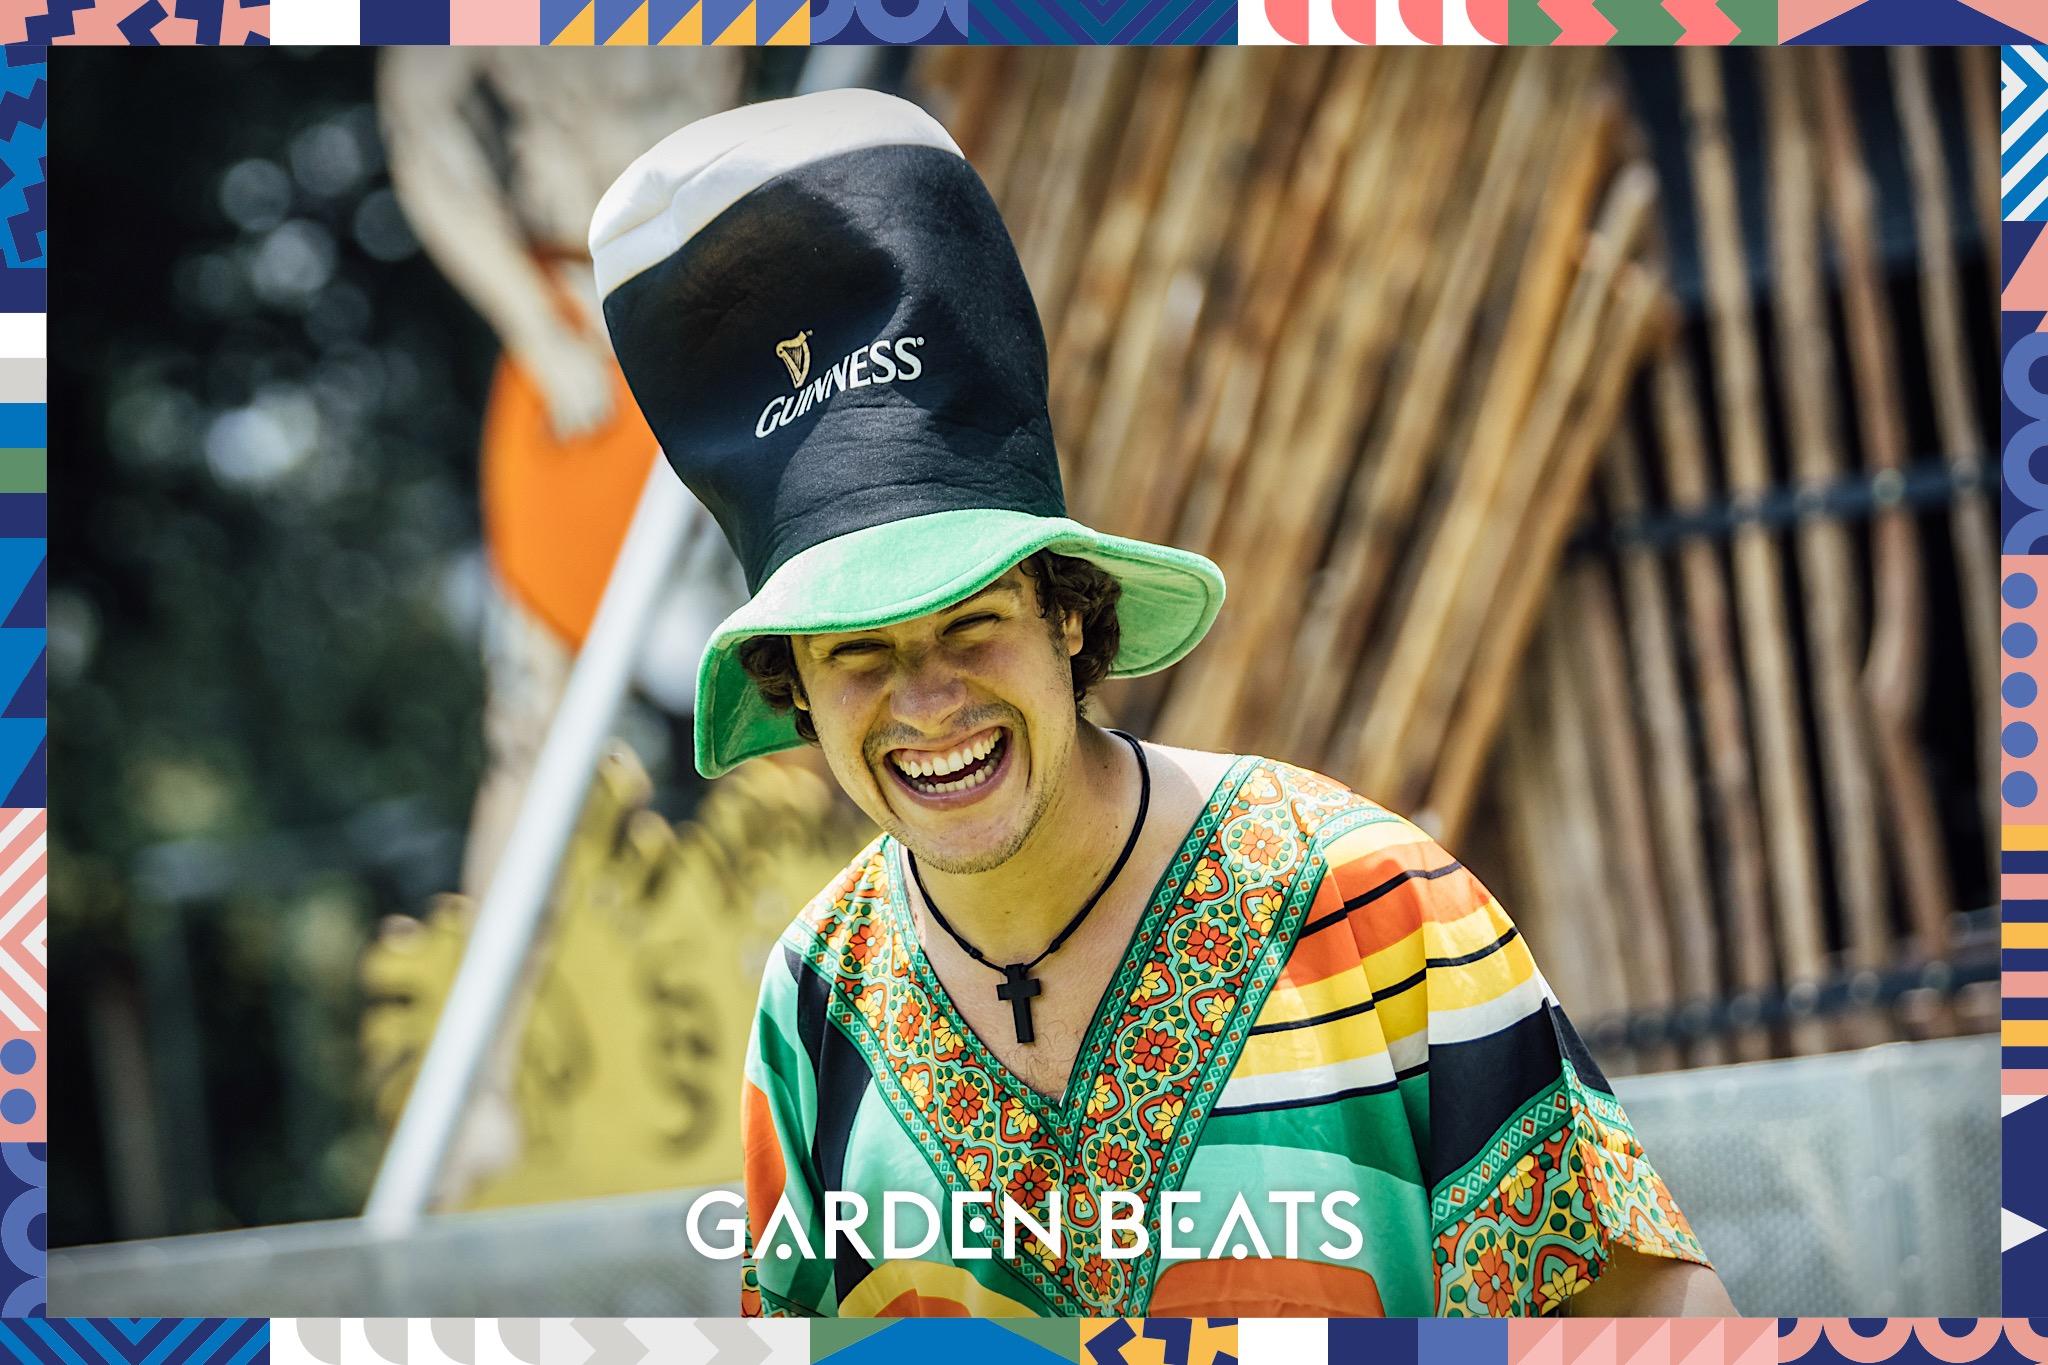 18032017_GardenBeats_Colossal129_WatermarkedGB.jpg